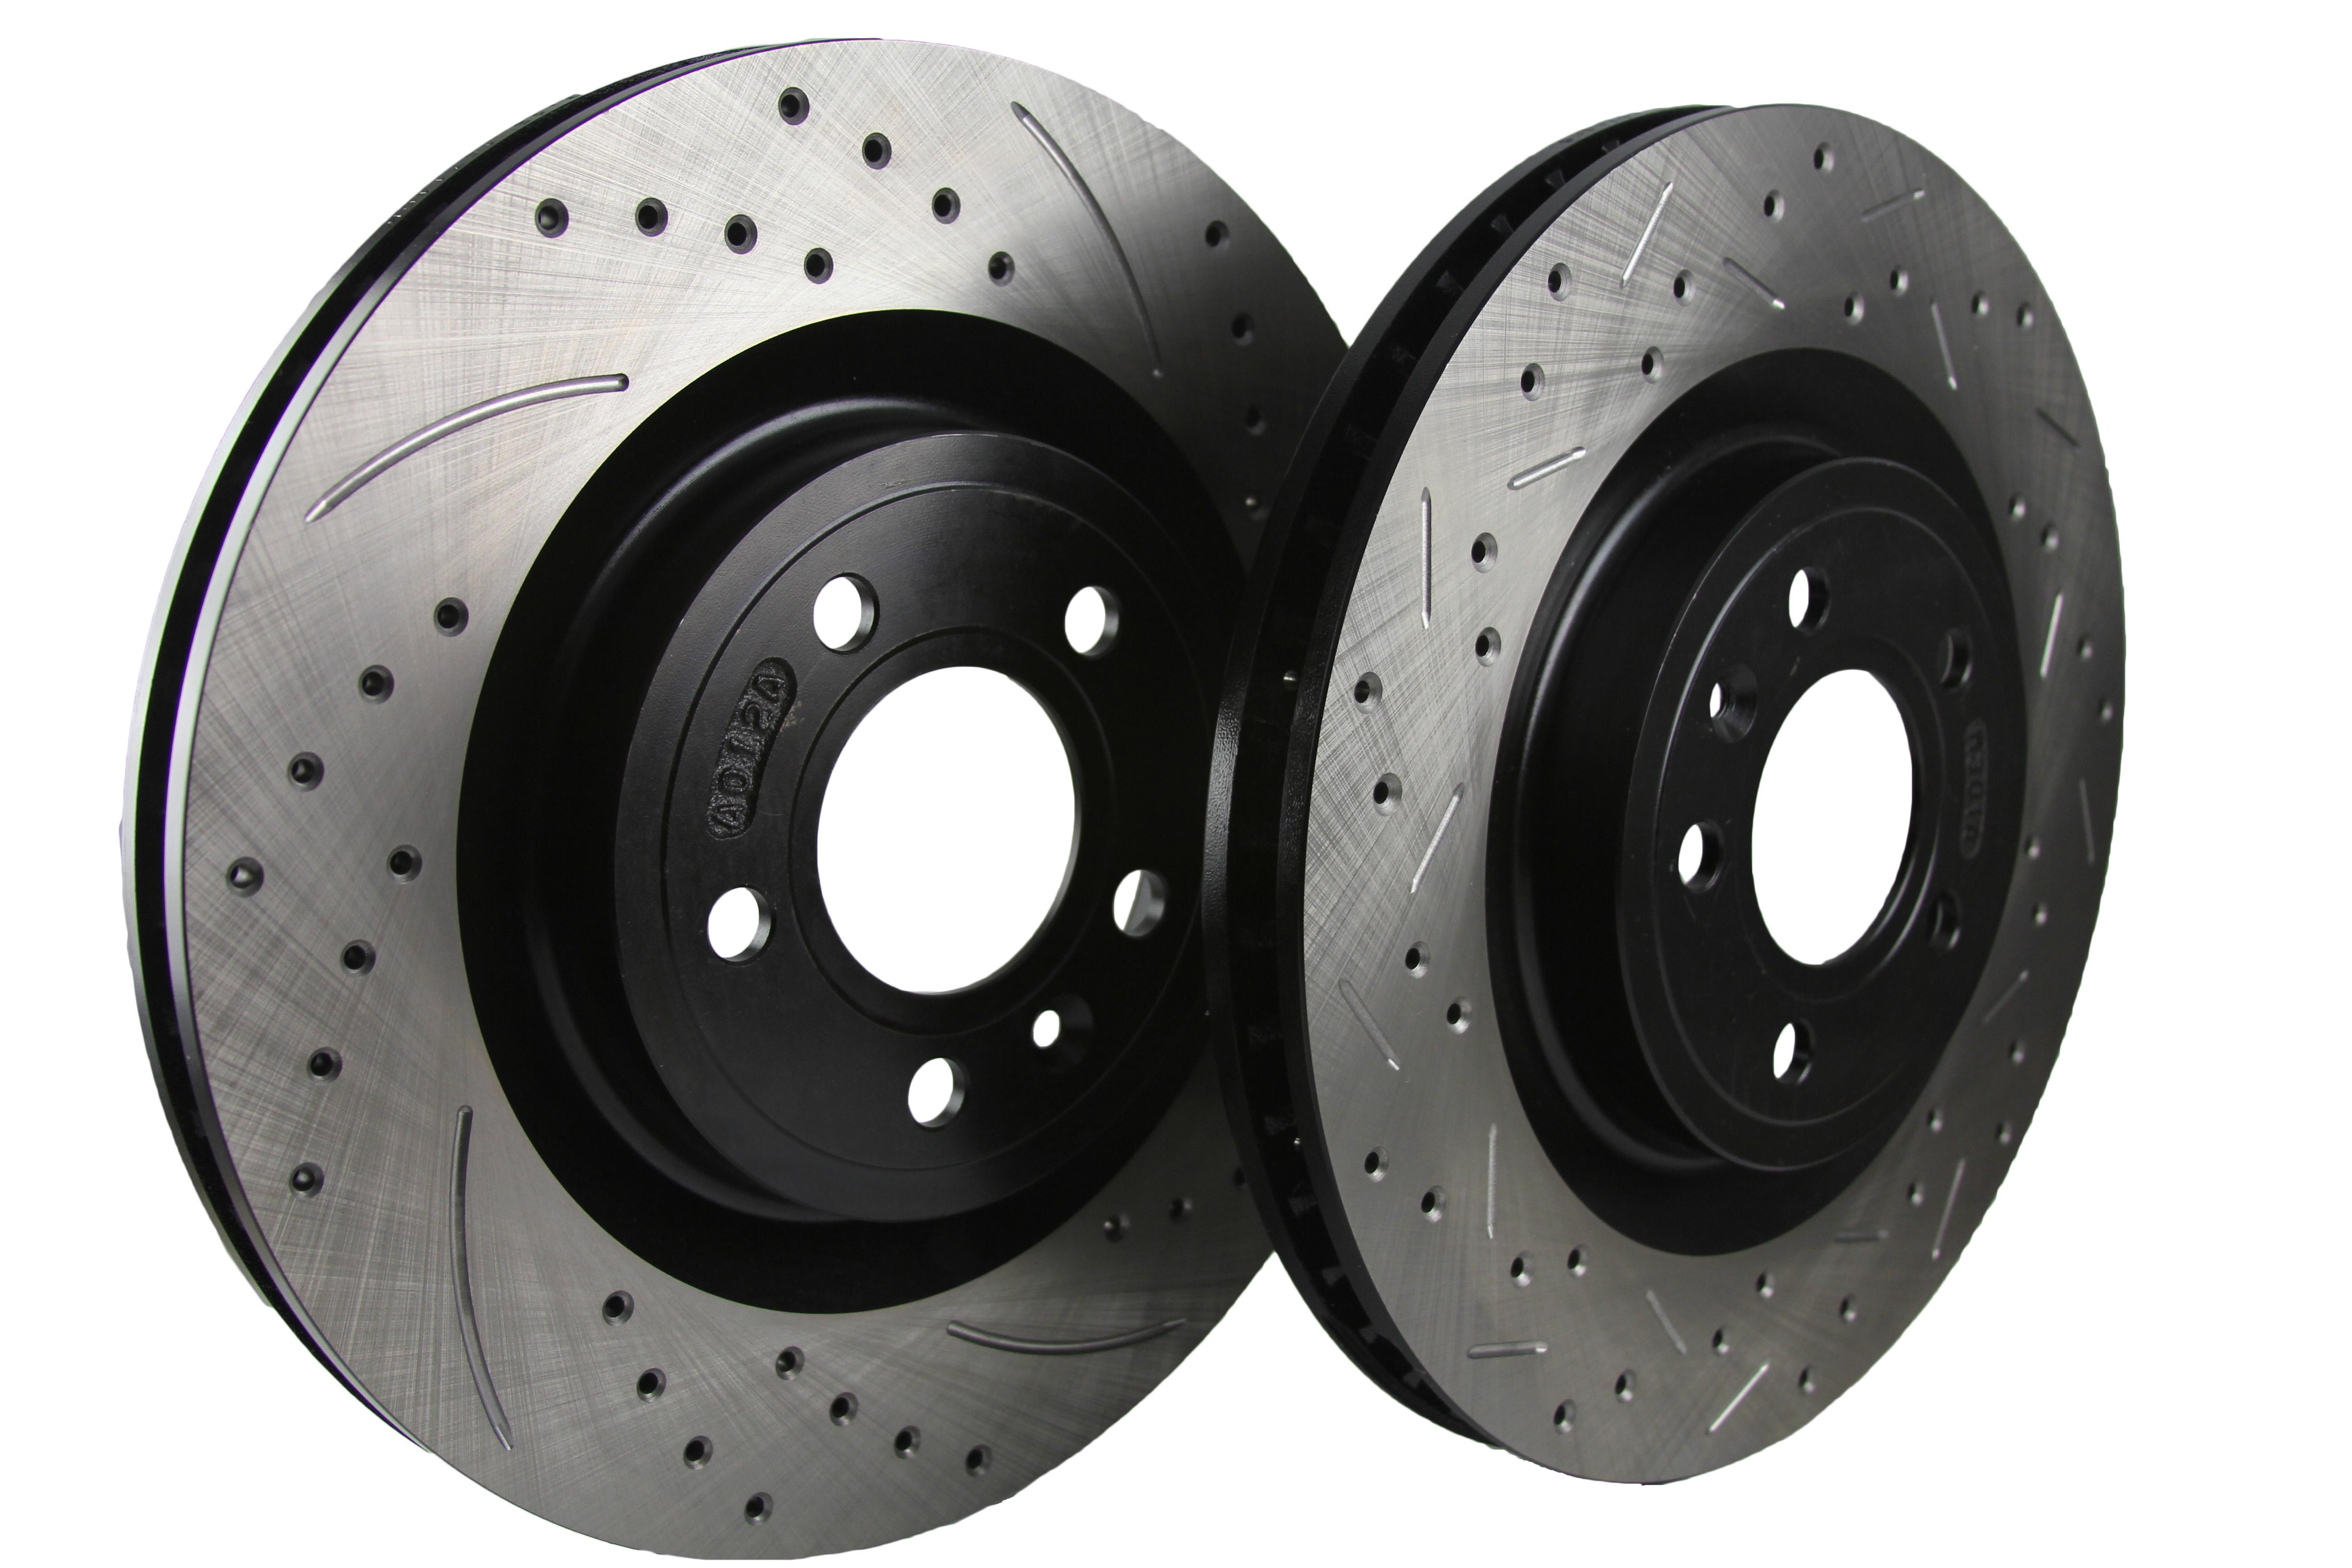 Brake Rotor Material : Premium brake disc rotor cquence